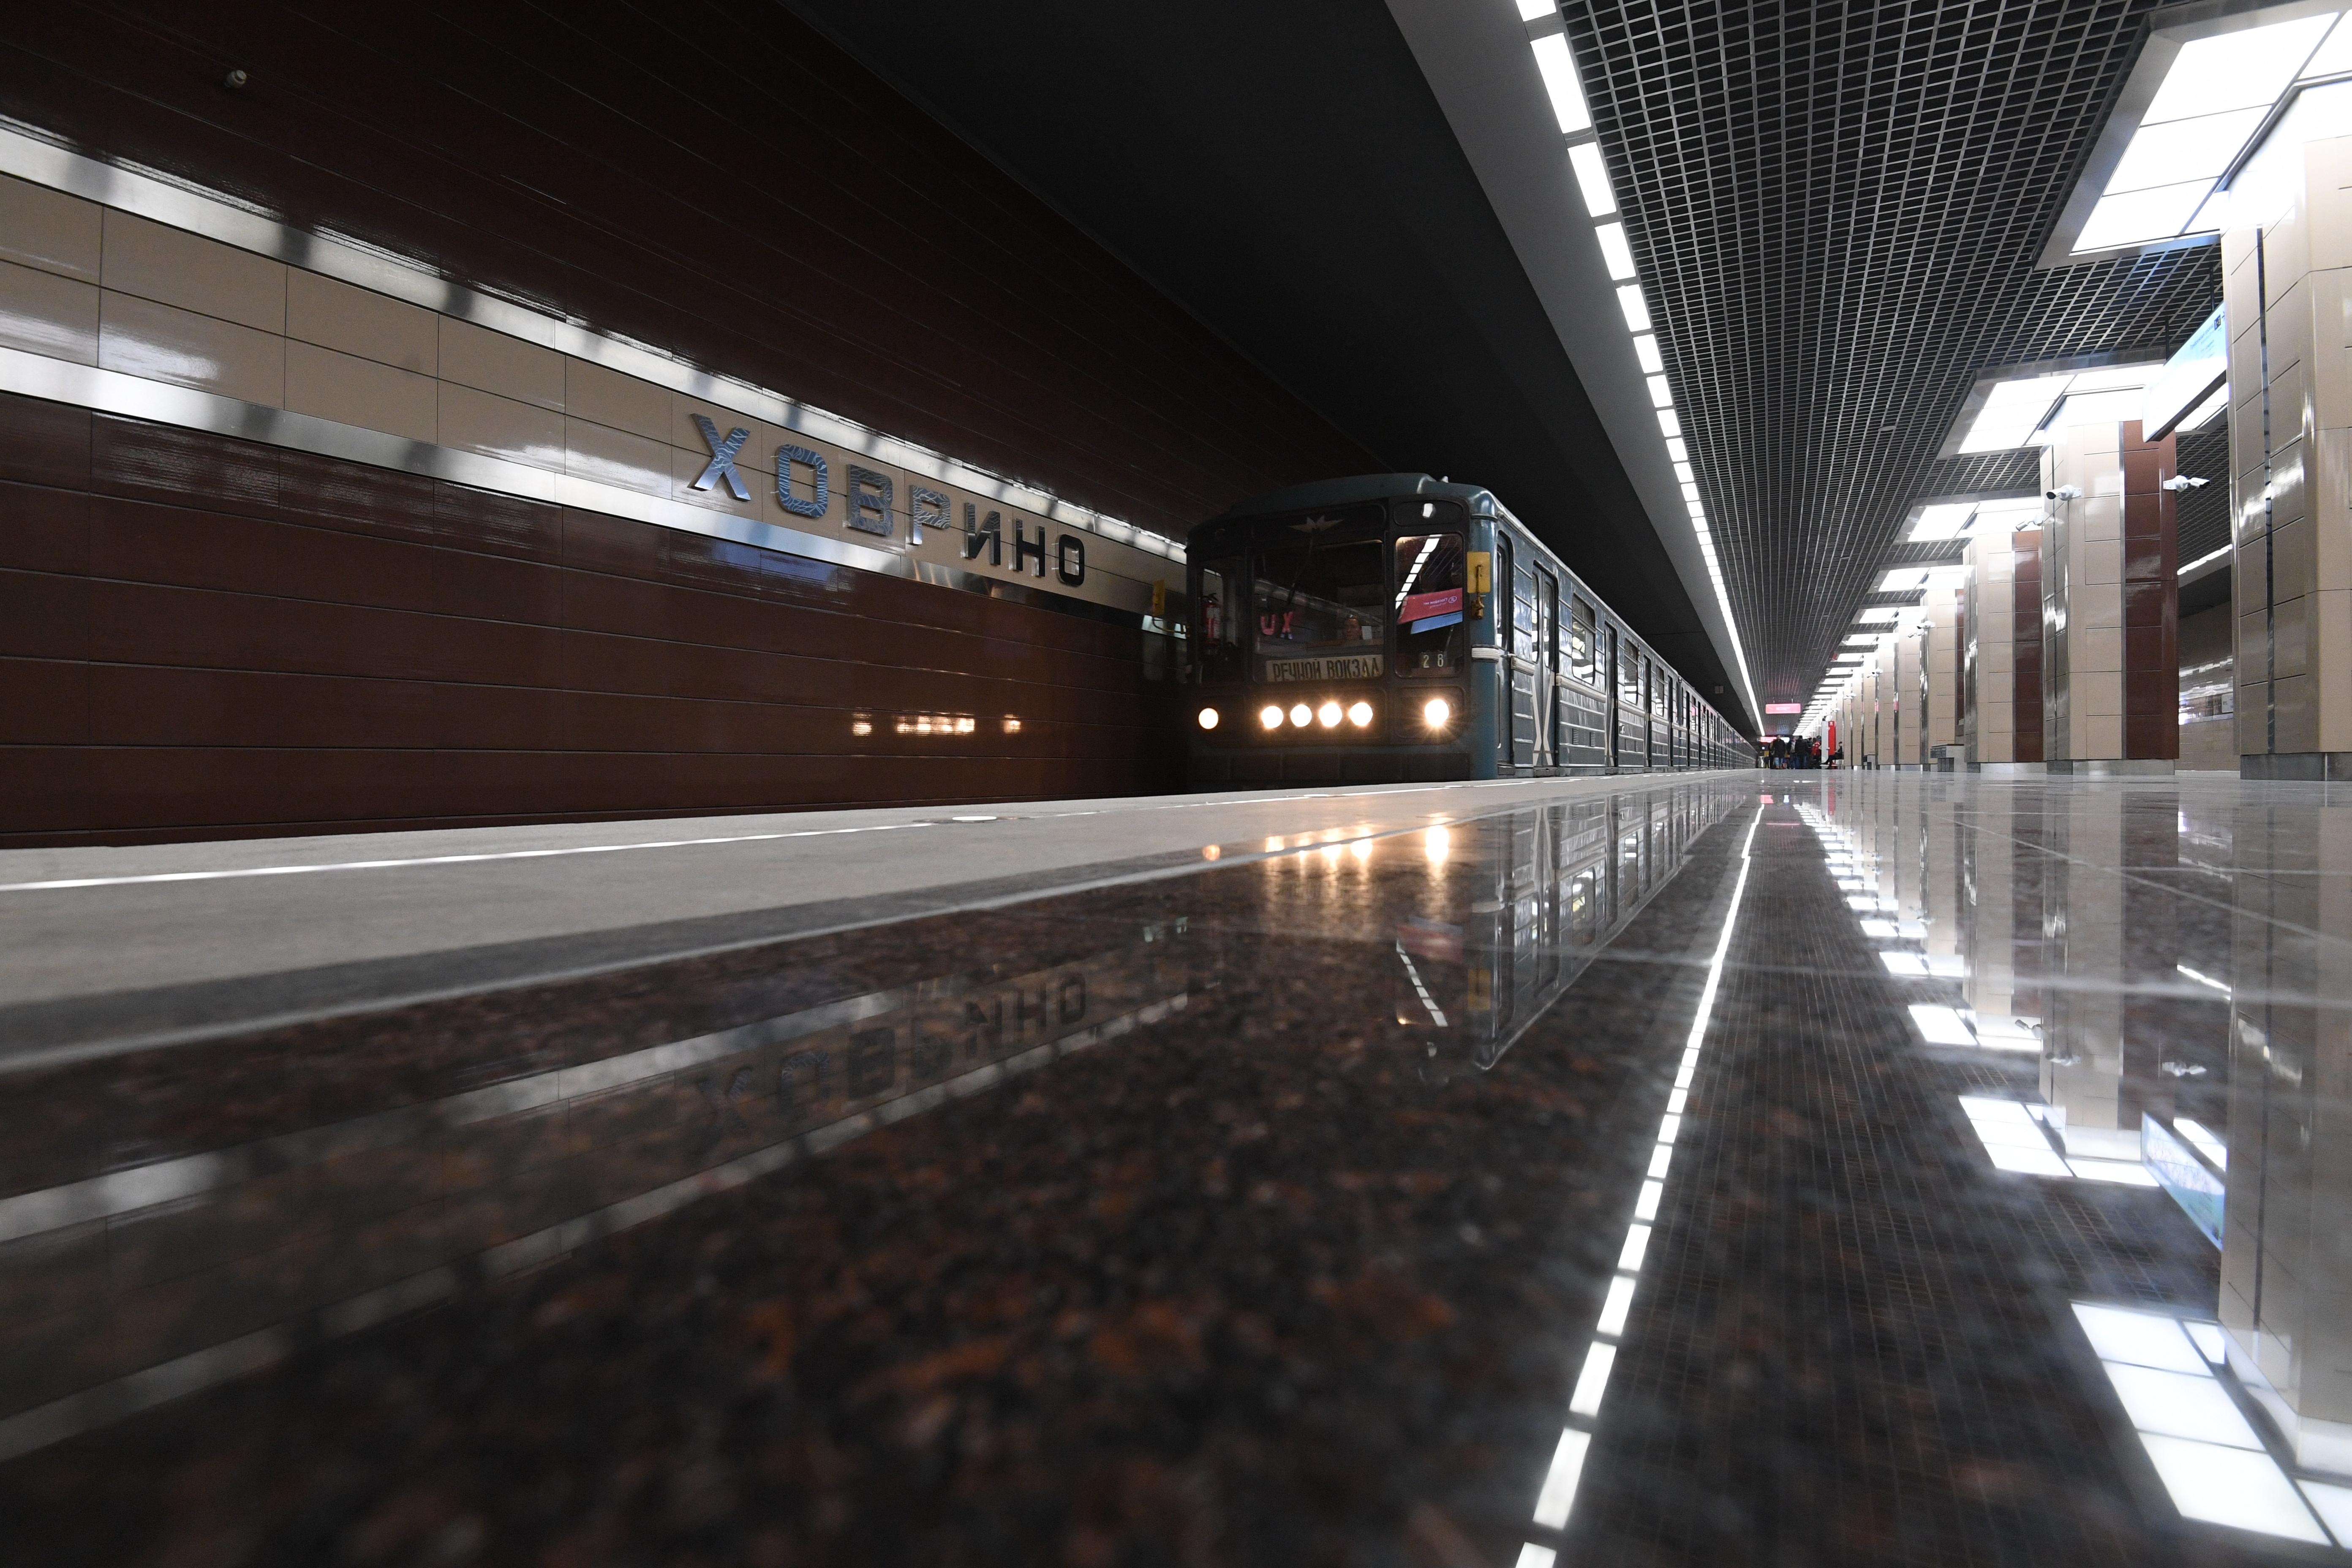 <p>Фото: &copy; РИА Новости / Григорий Сысоев</p>